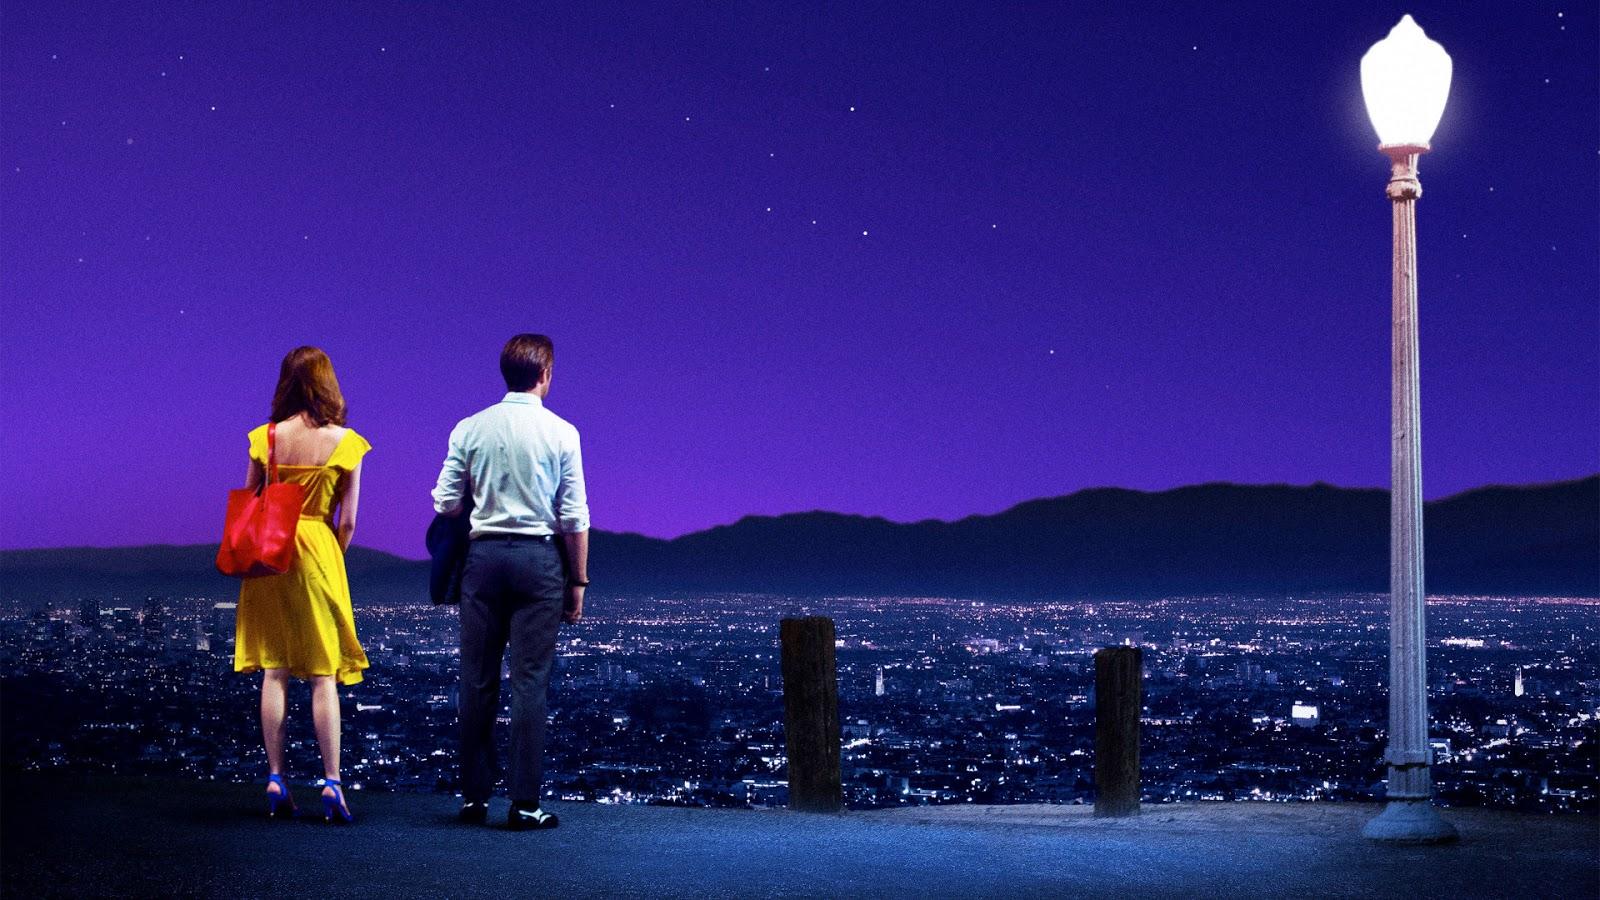 8. La La Land (2016)